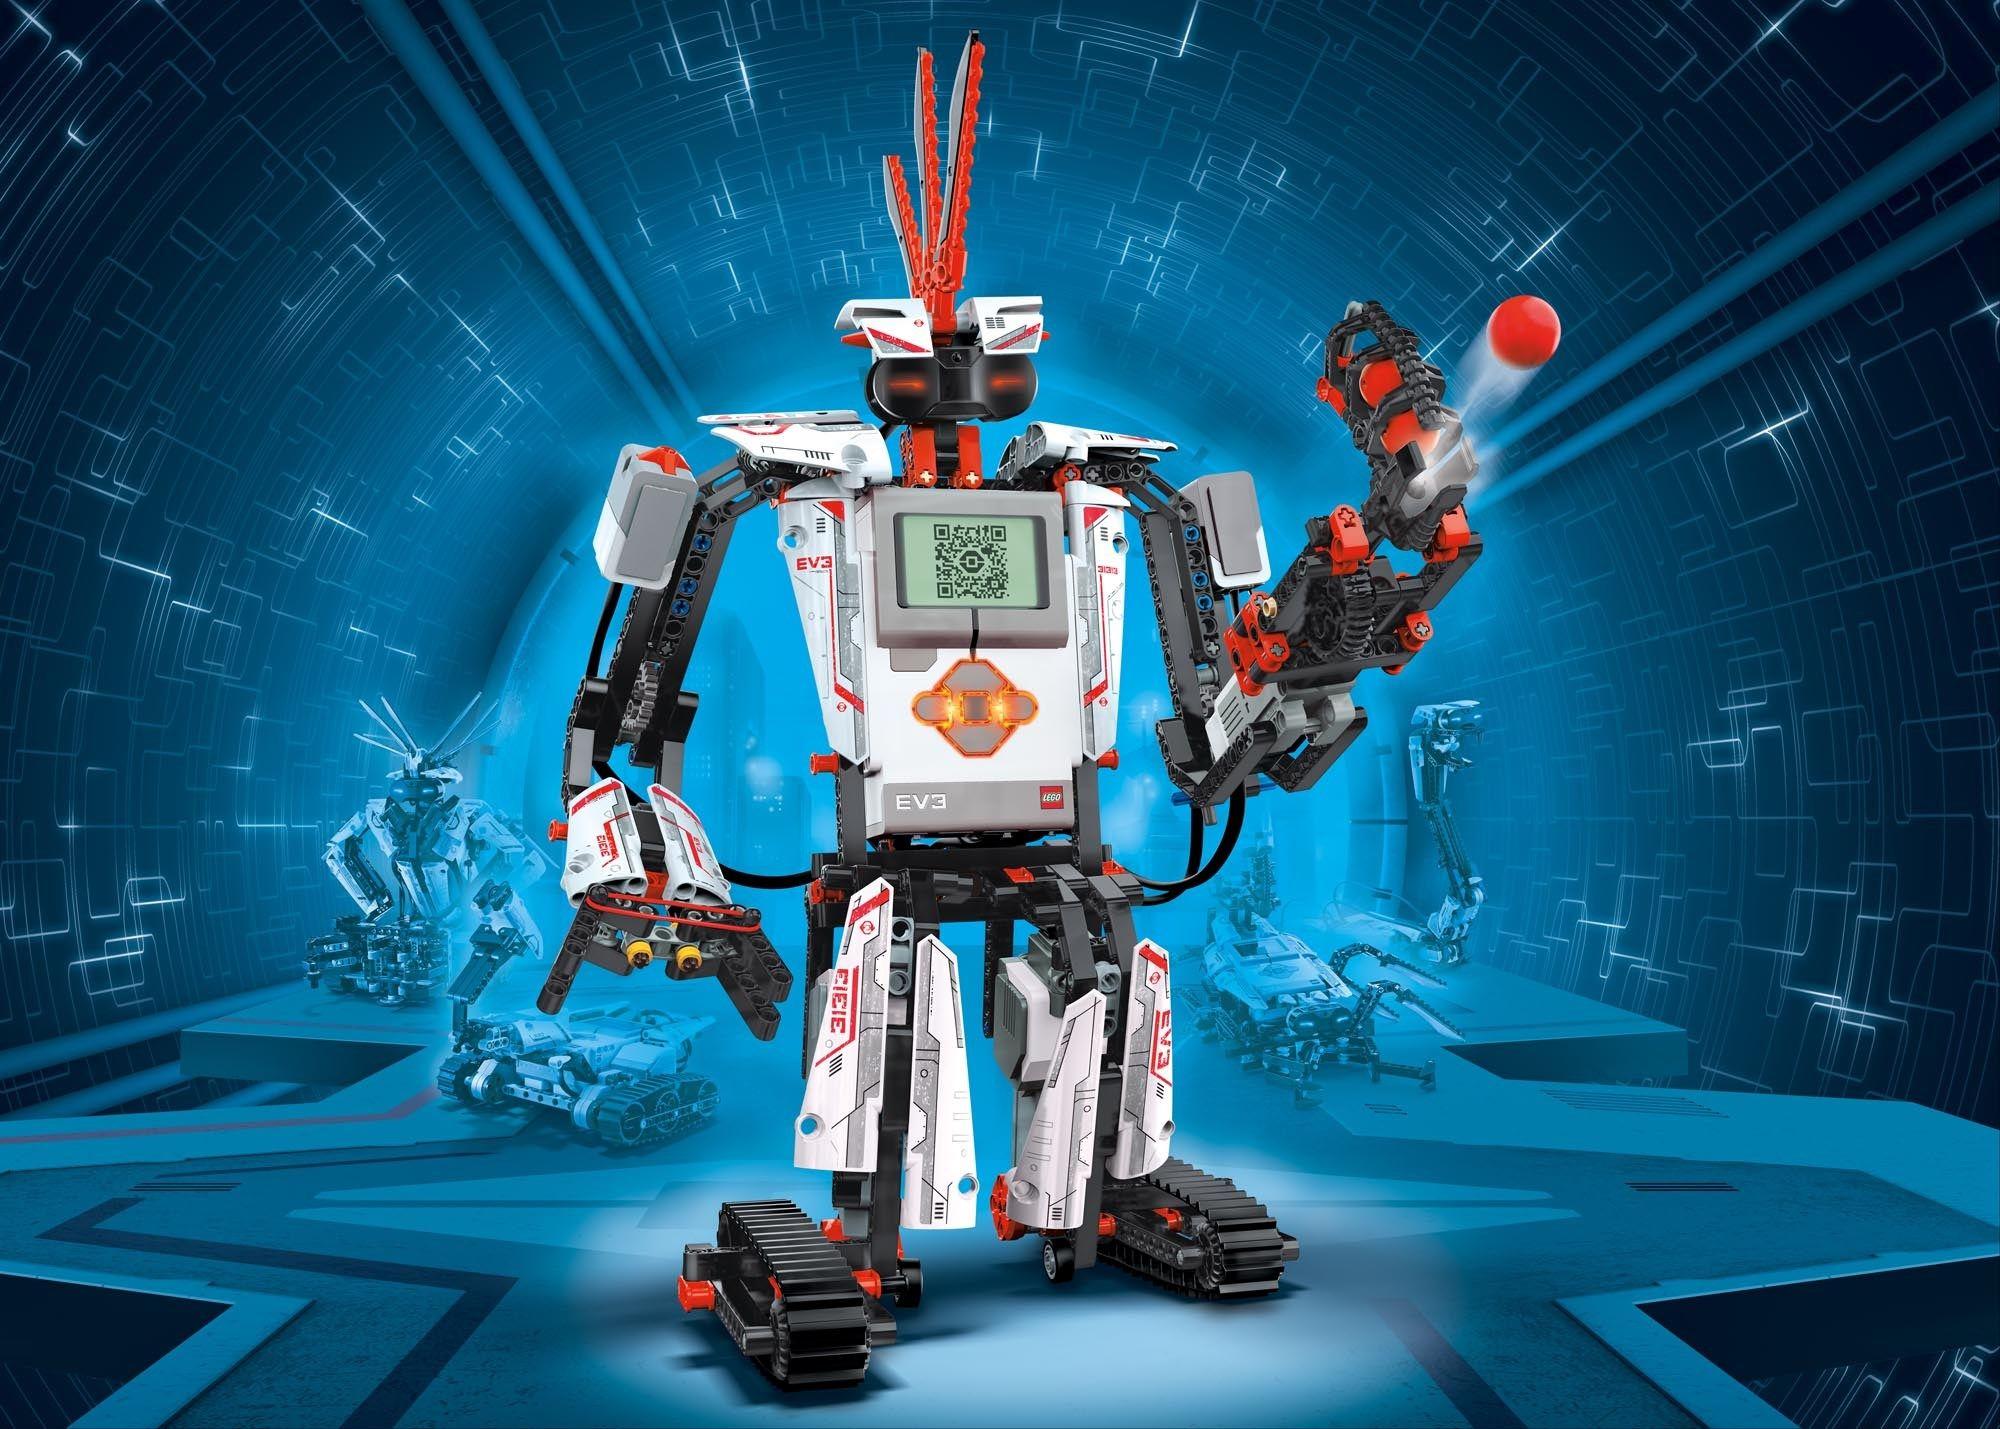 Robot Computer Wallpaper Lego Mindstorms Lego Camp Summer Learning Activities